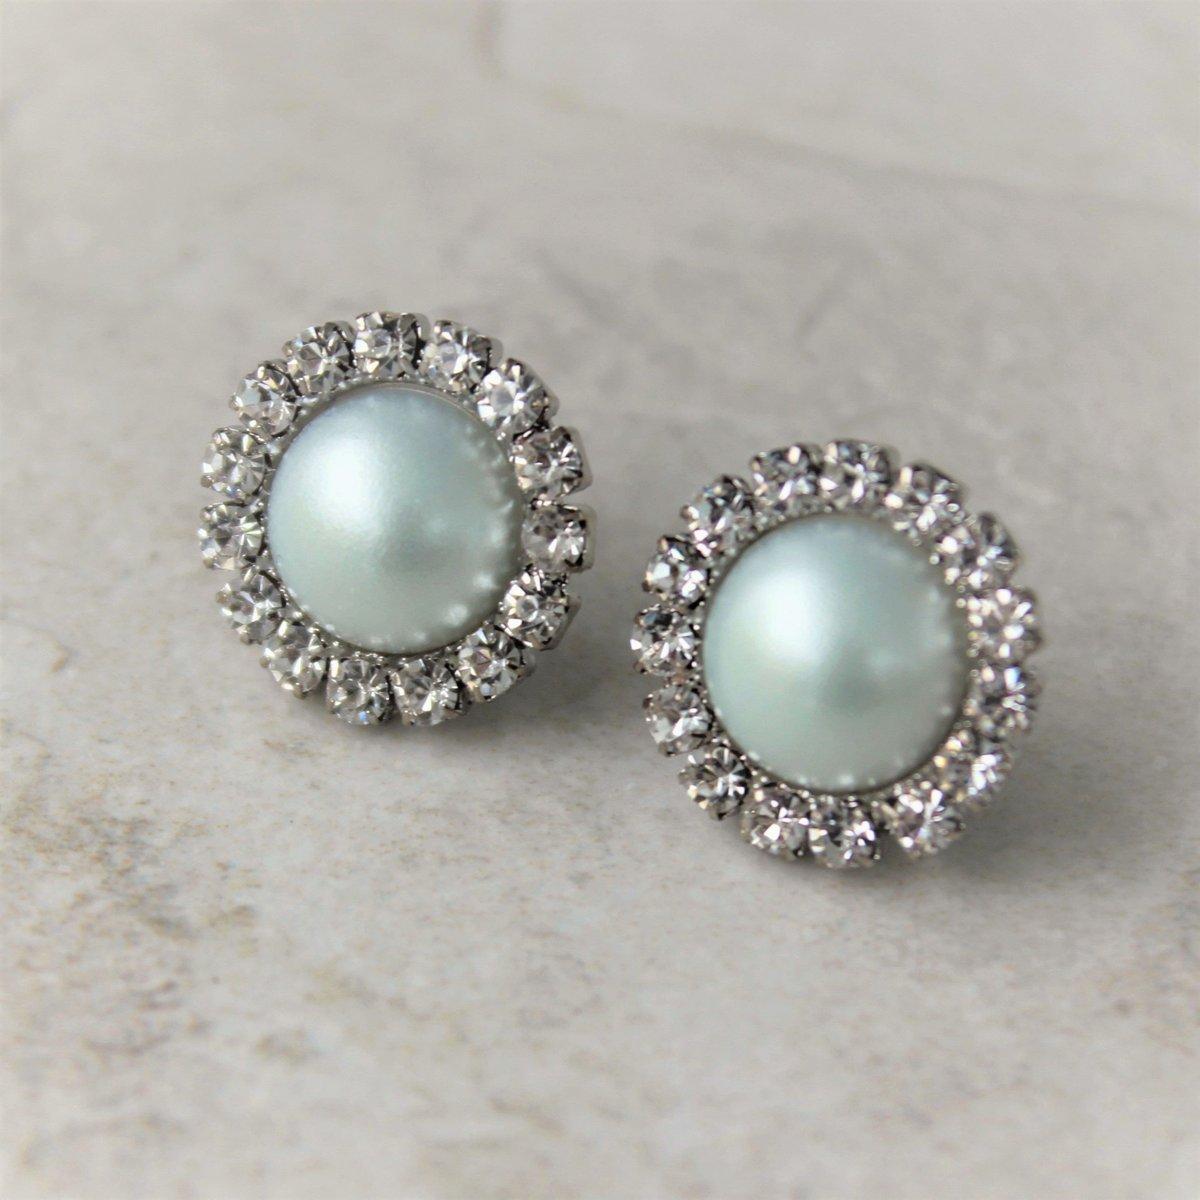 Mint Green Pearl Bridesmaid Earrings, Mint Earrings, Stud Earrings, Mint Bridesmaid Earrings, Pale Mint Wedding Jewelry, Mint Green Wedding  #style #shopping #ecommerce #etsy #etsyshop #gifts #smallbiz #shopsmall